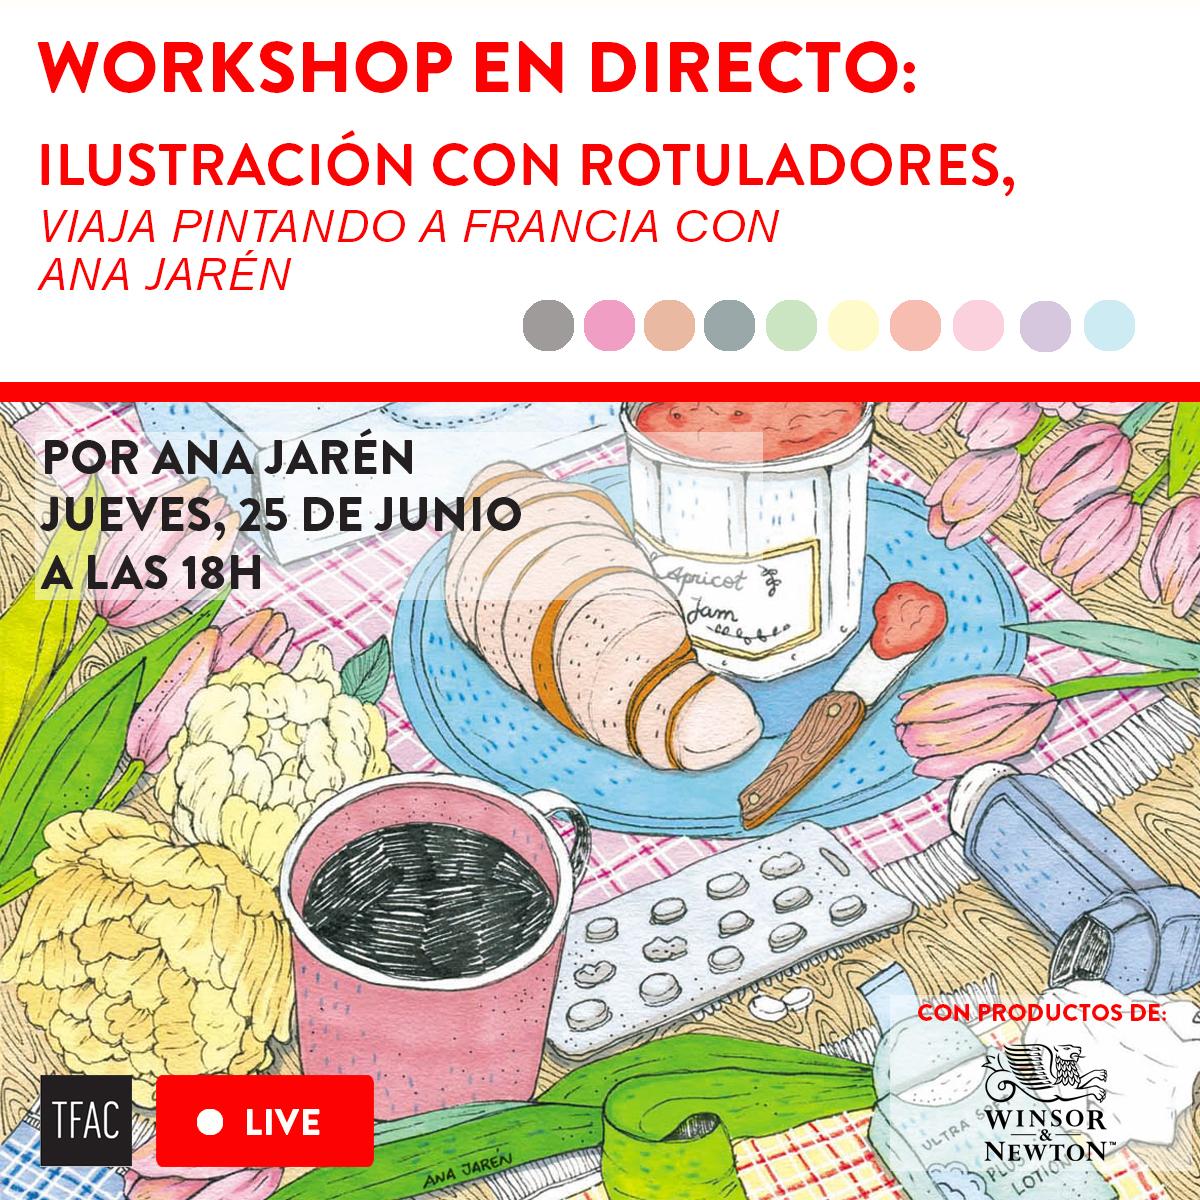 Viaja pintando a Francia con Ana Jarén: workshop de ilustración con rotuladores